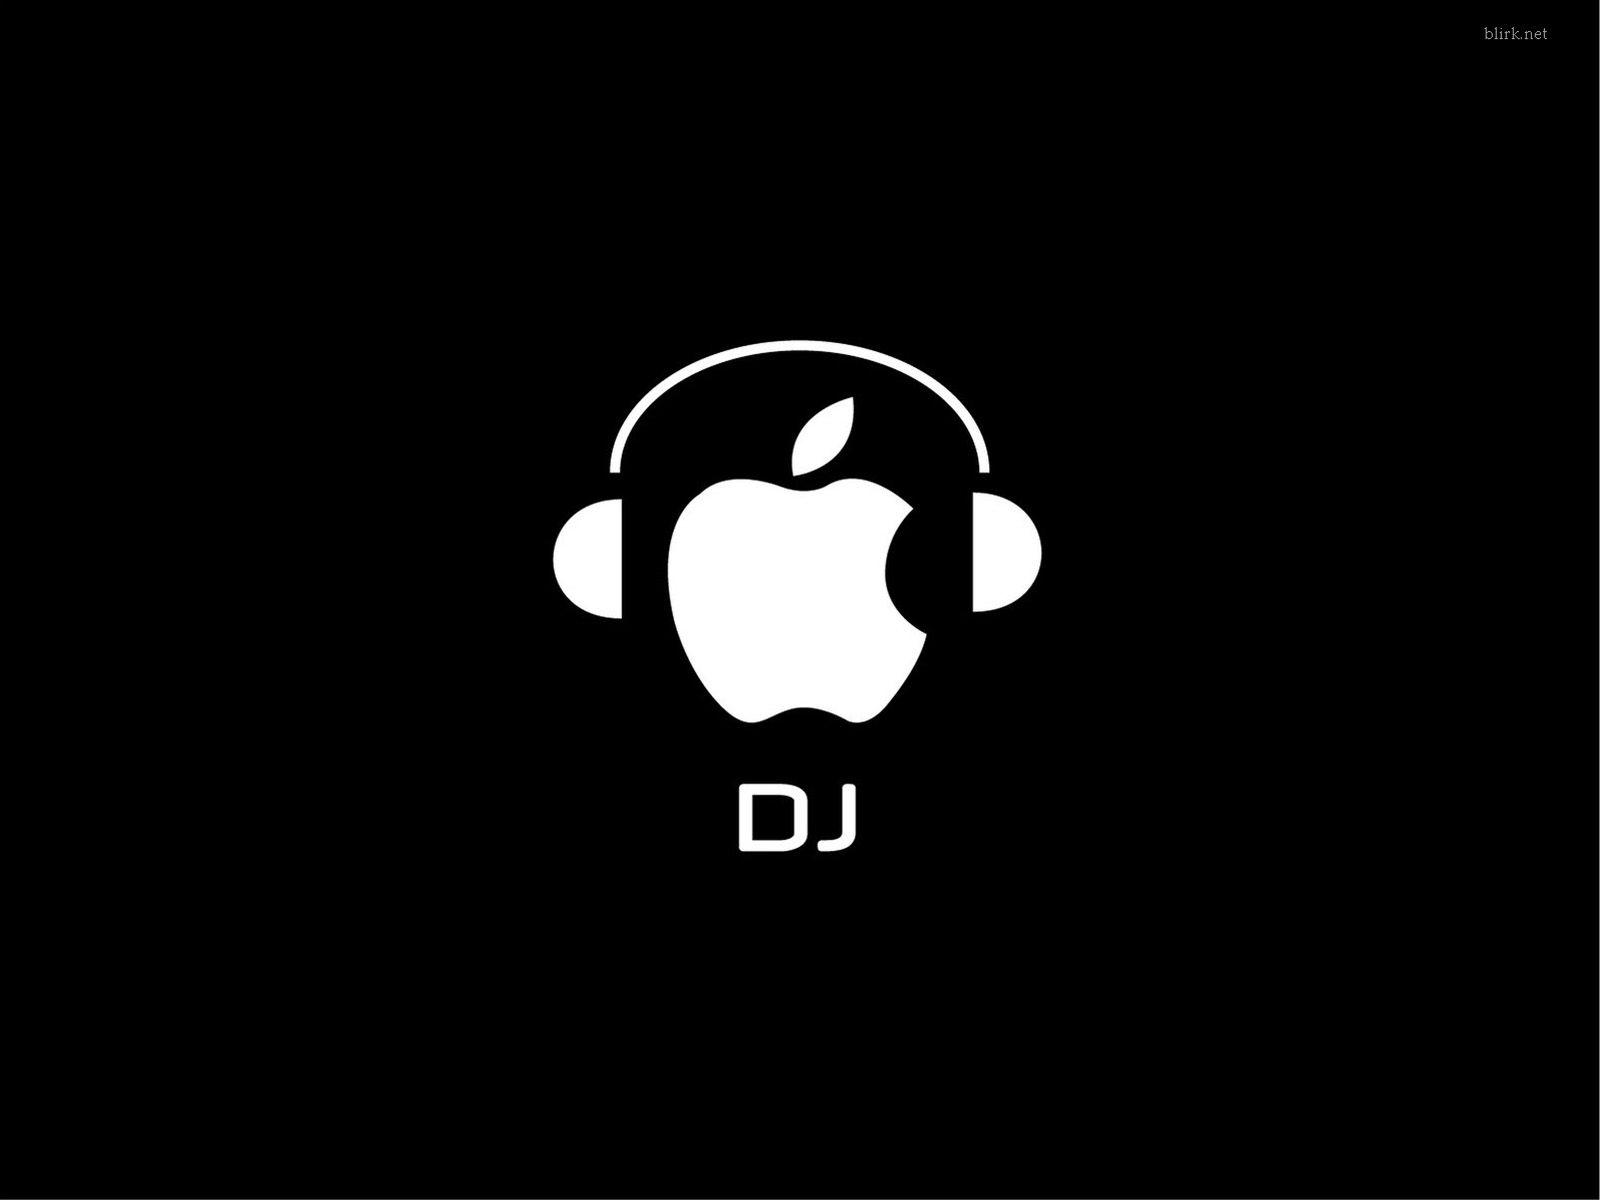 Dj Logo Wallpapers Hd Unlimited Clipart Design